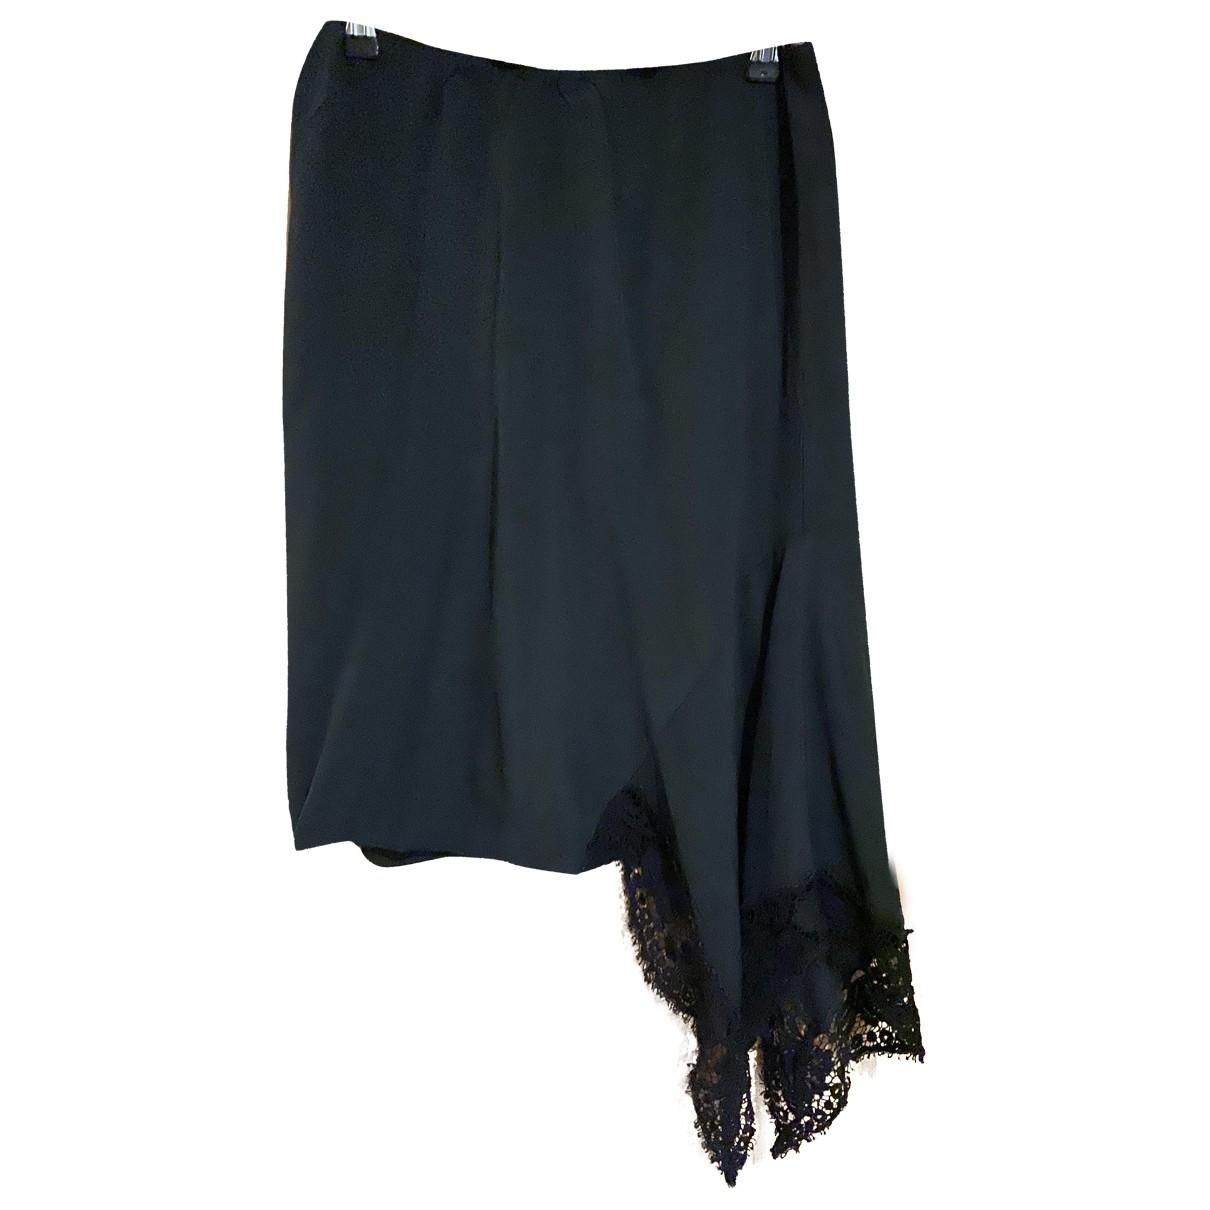 Falda midi N°21